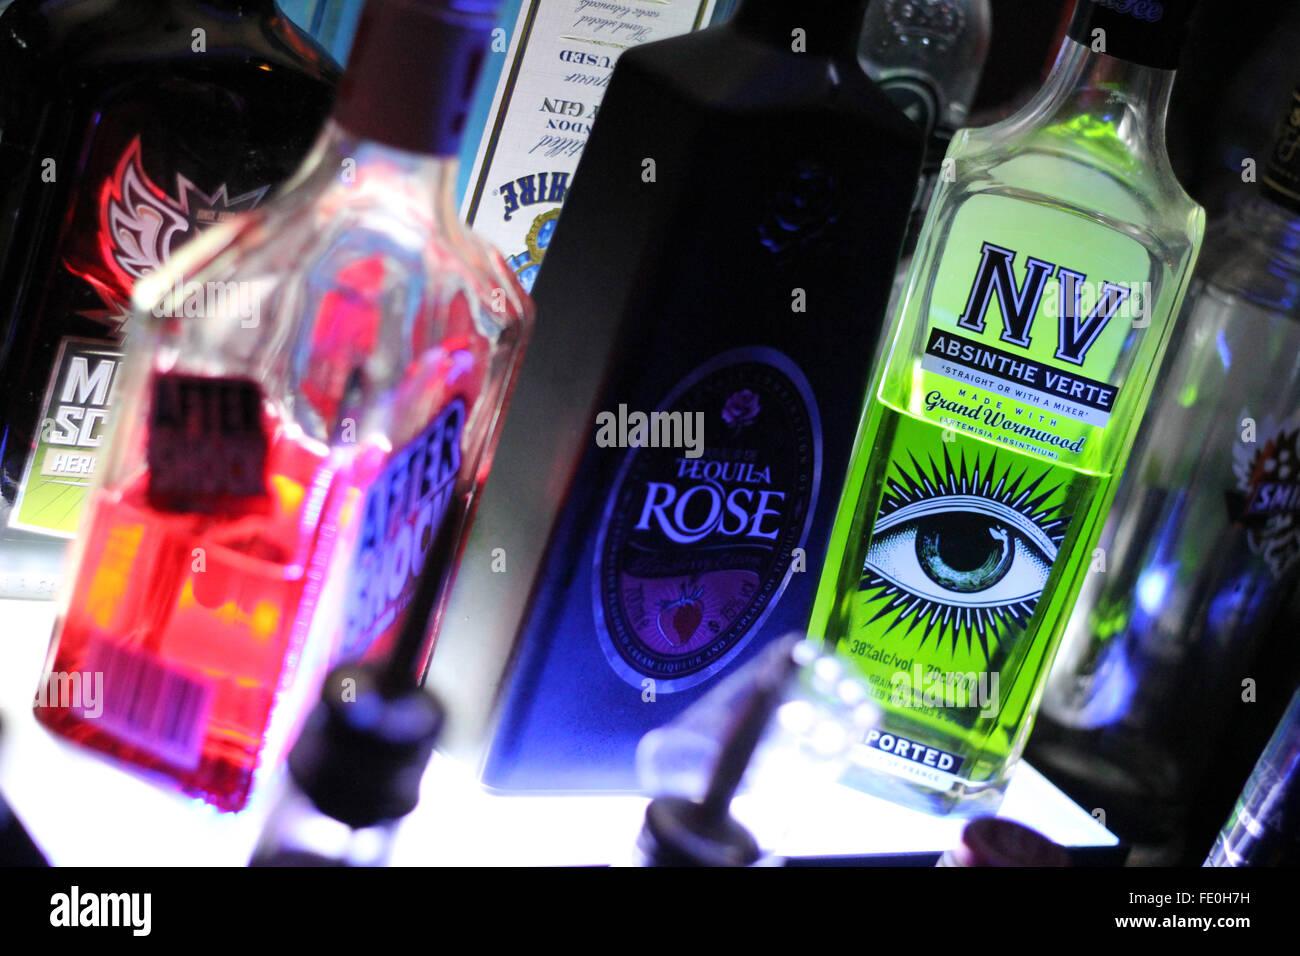 Cardiff, Wales, 12.06.2014, Foto an Sicherung Bar in Cardiff, © AimeeHerd Freelance Stockfoto